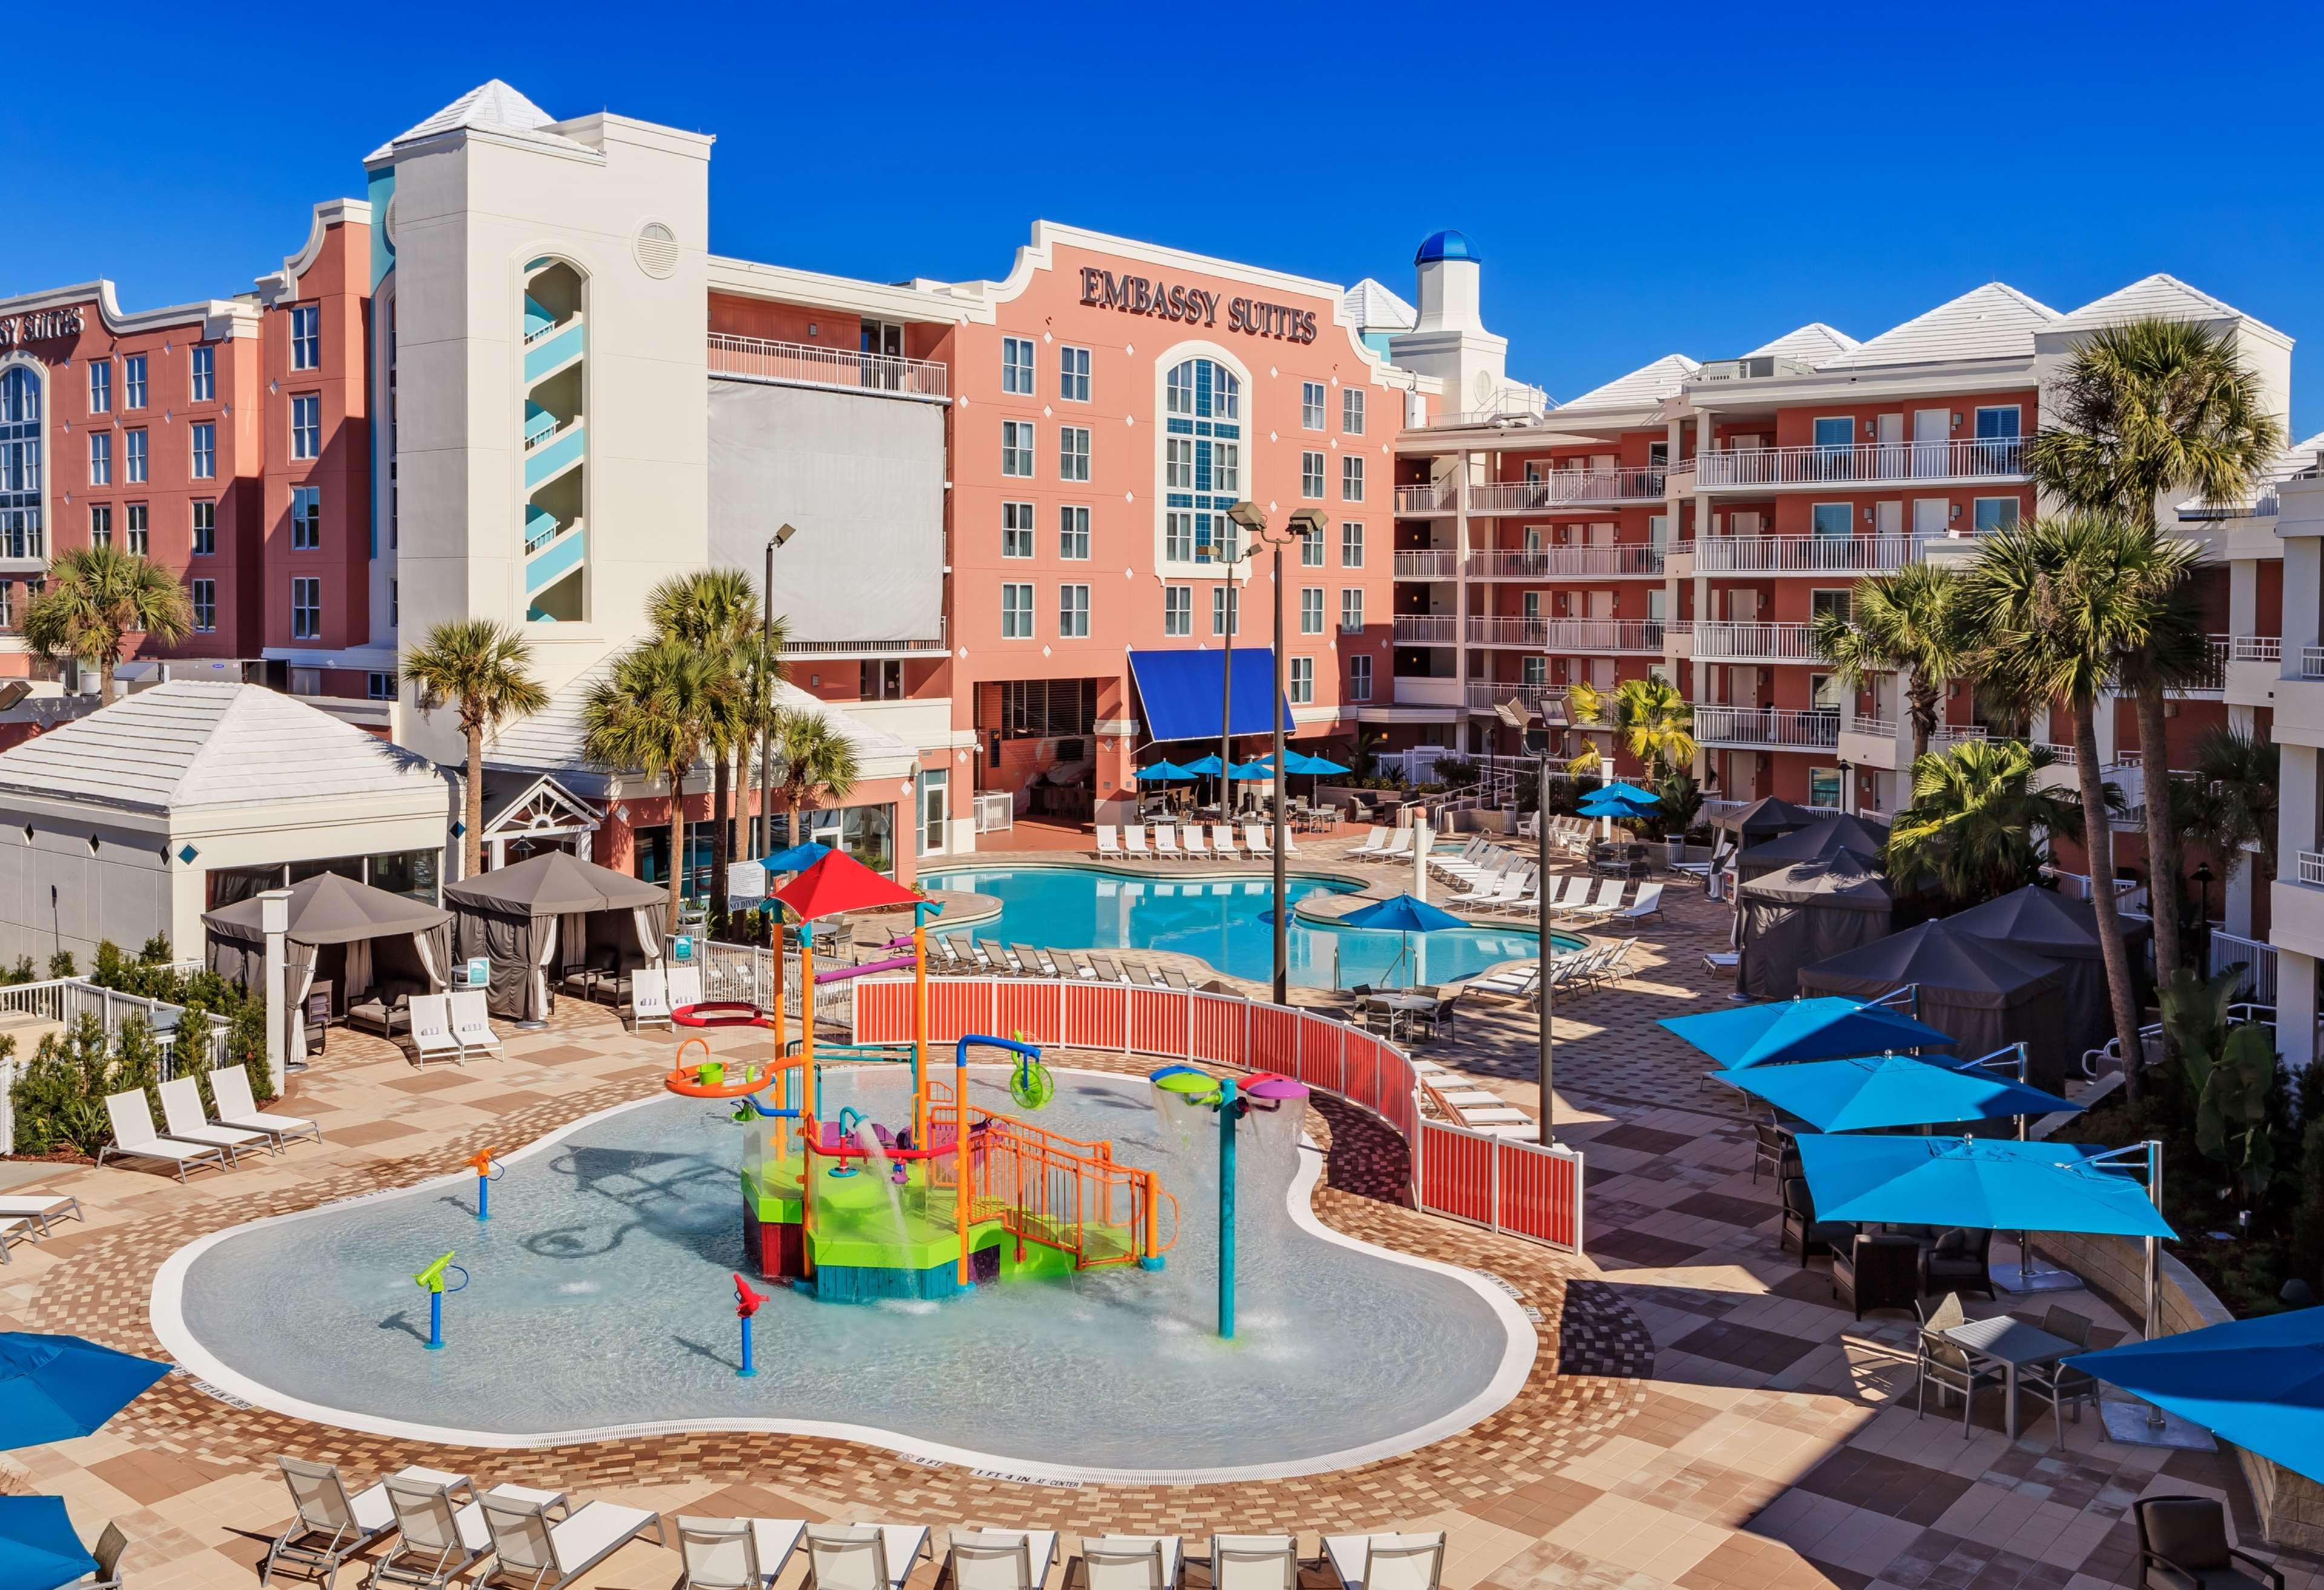 Embassy Suites by Hilton Orlando Lake Buena Vista Resort image 7